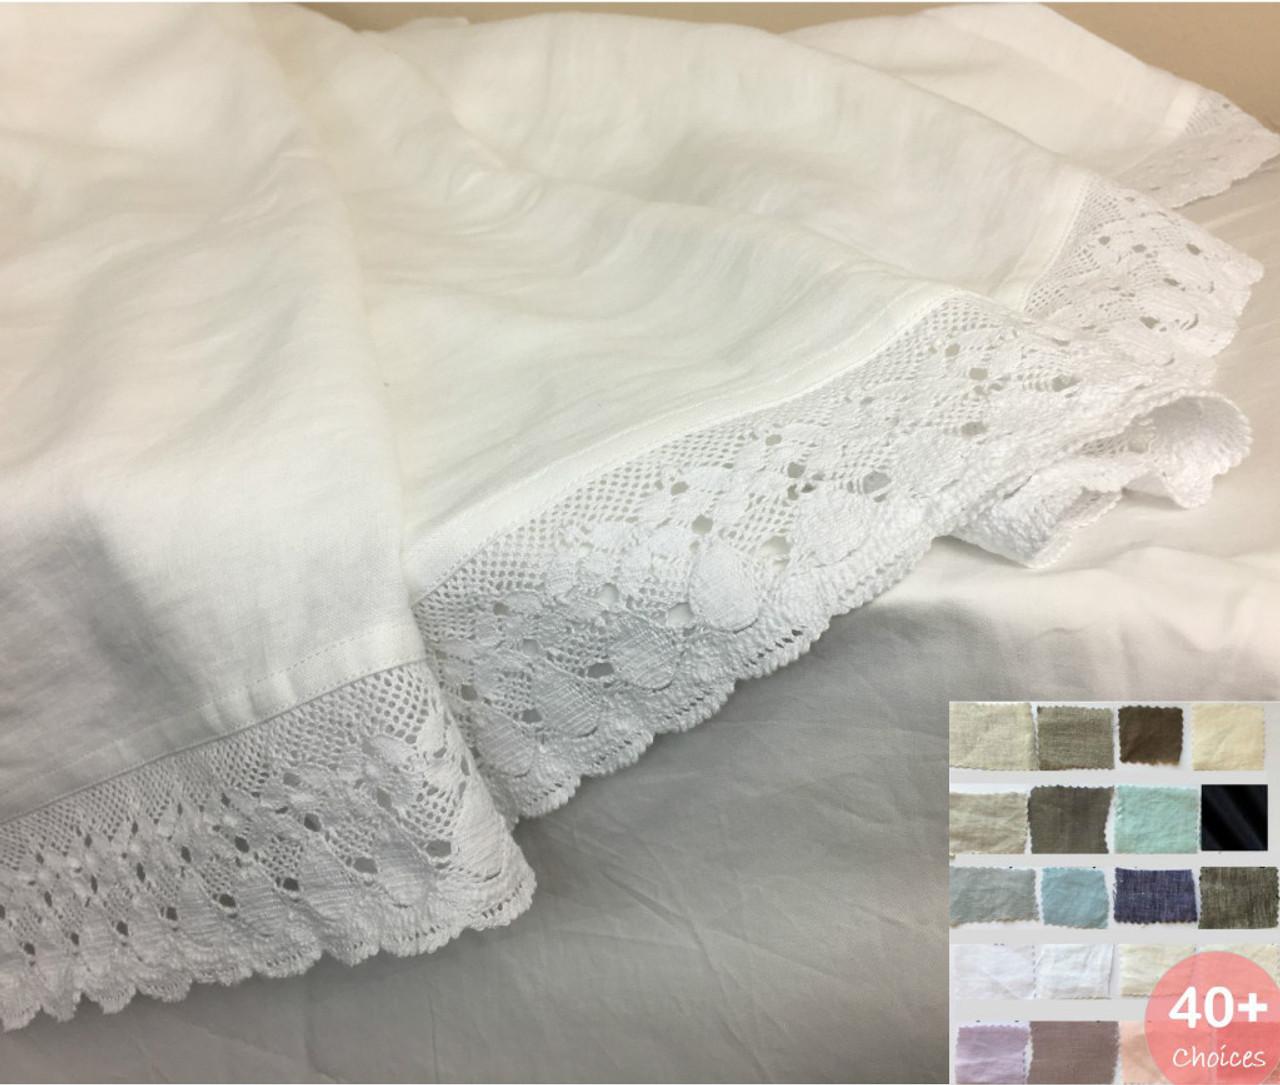 Natural Linen Bed Sheet With Crochet Lace Trim 40 Linen Fabric